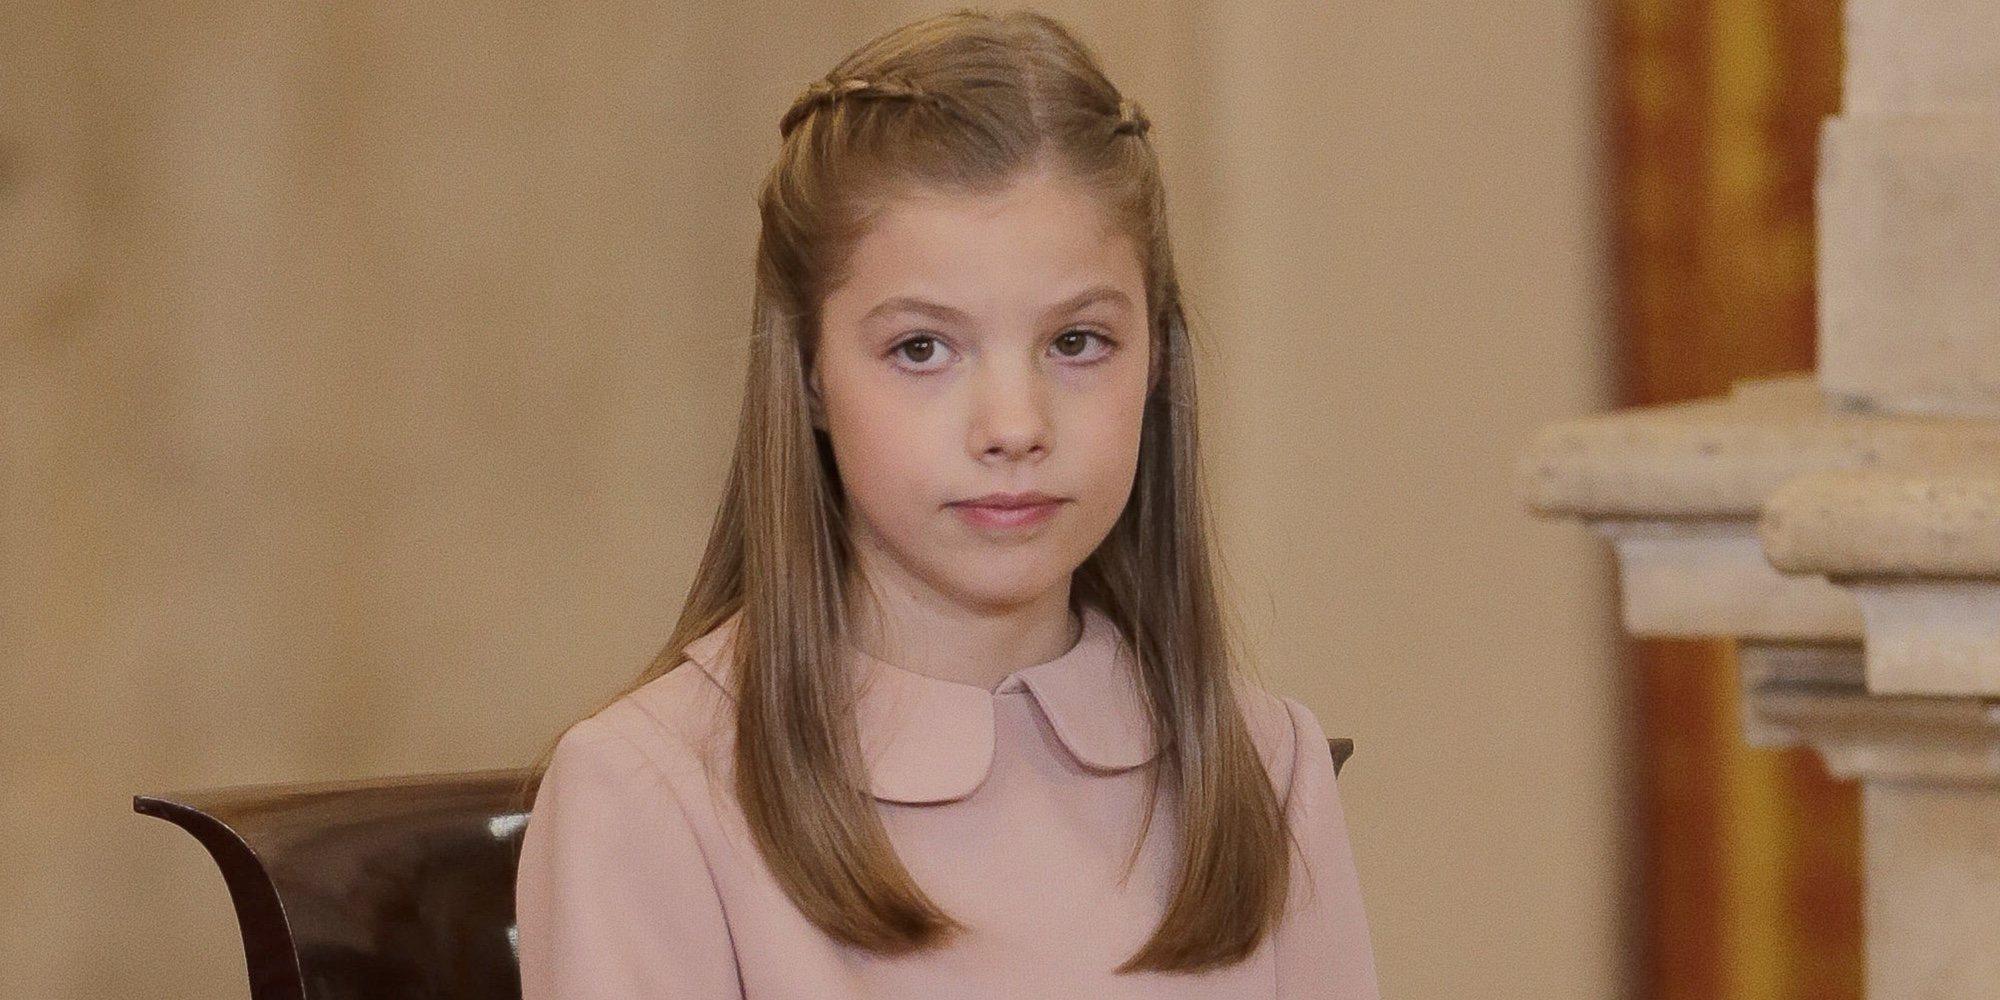 La incógnita que rodea el futuro de la Infanta Sofía por culpa de la Infanta Cristina e Iñaki Urdangarin